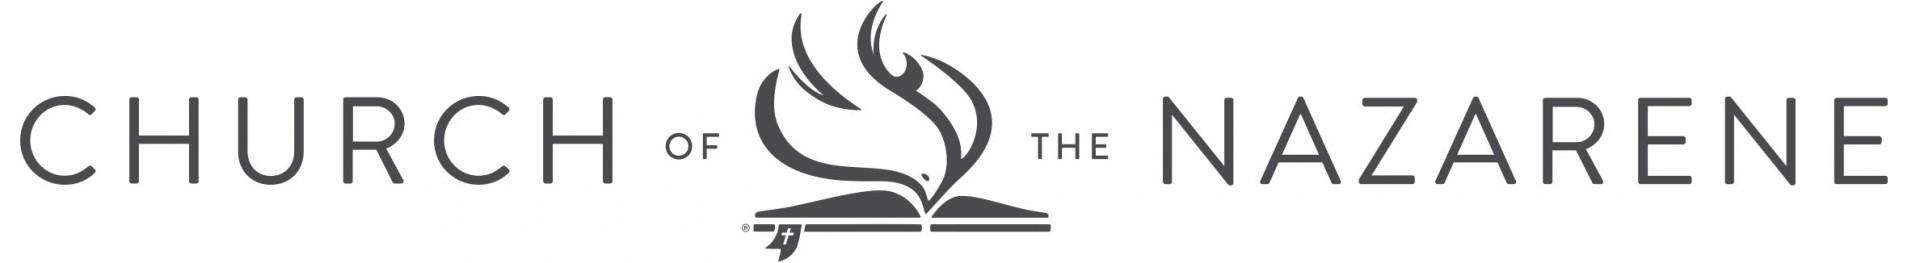 Logansport First Church of the Nazarene || Ministries